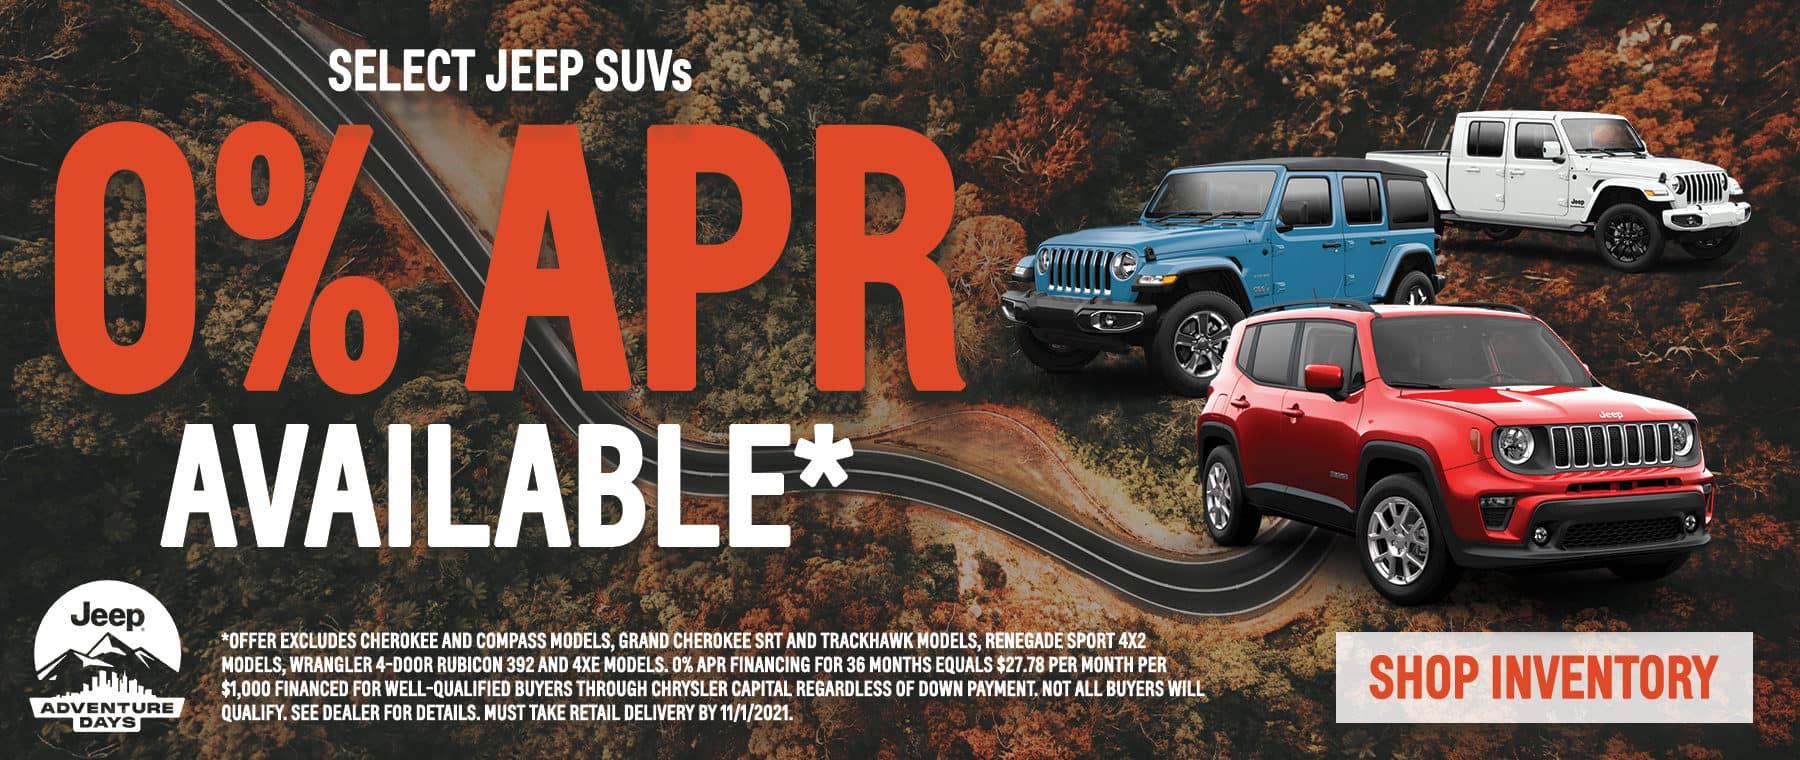 Jeep SUVs